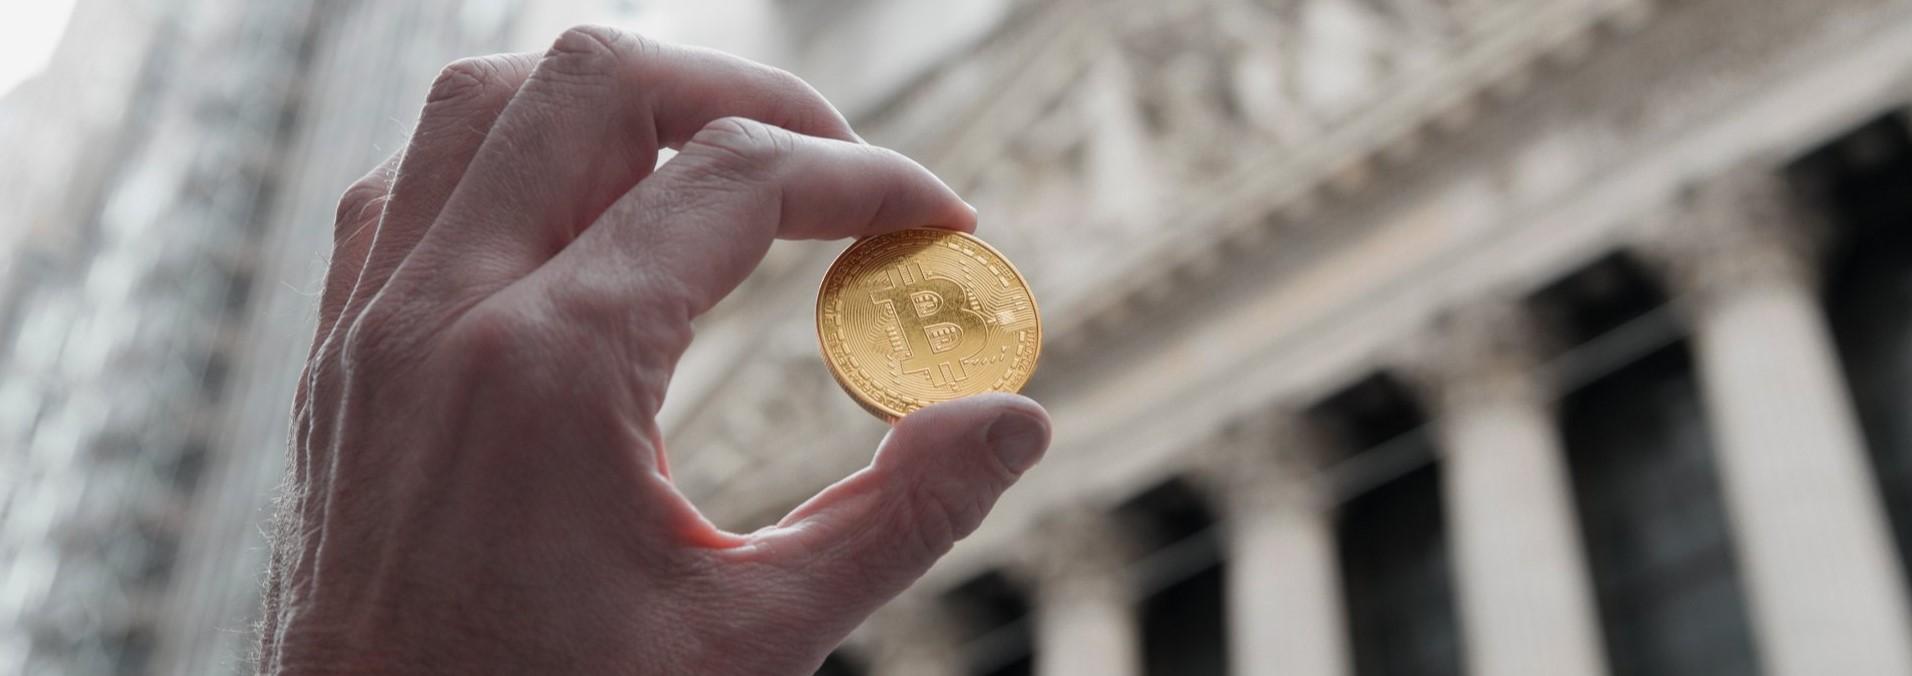 Основатель Kenetic Capital прогнозирует падение биткоина ниже $30 000